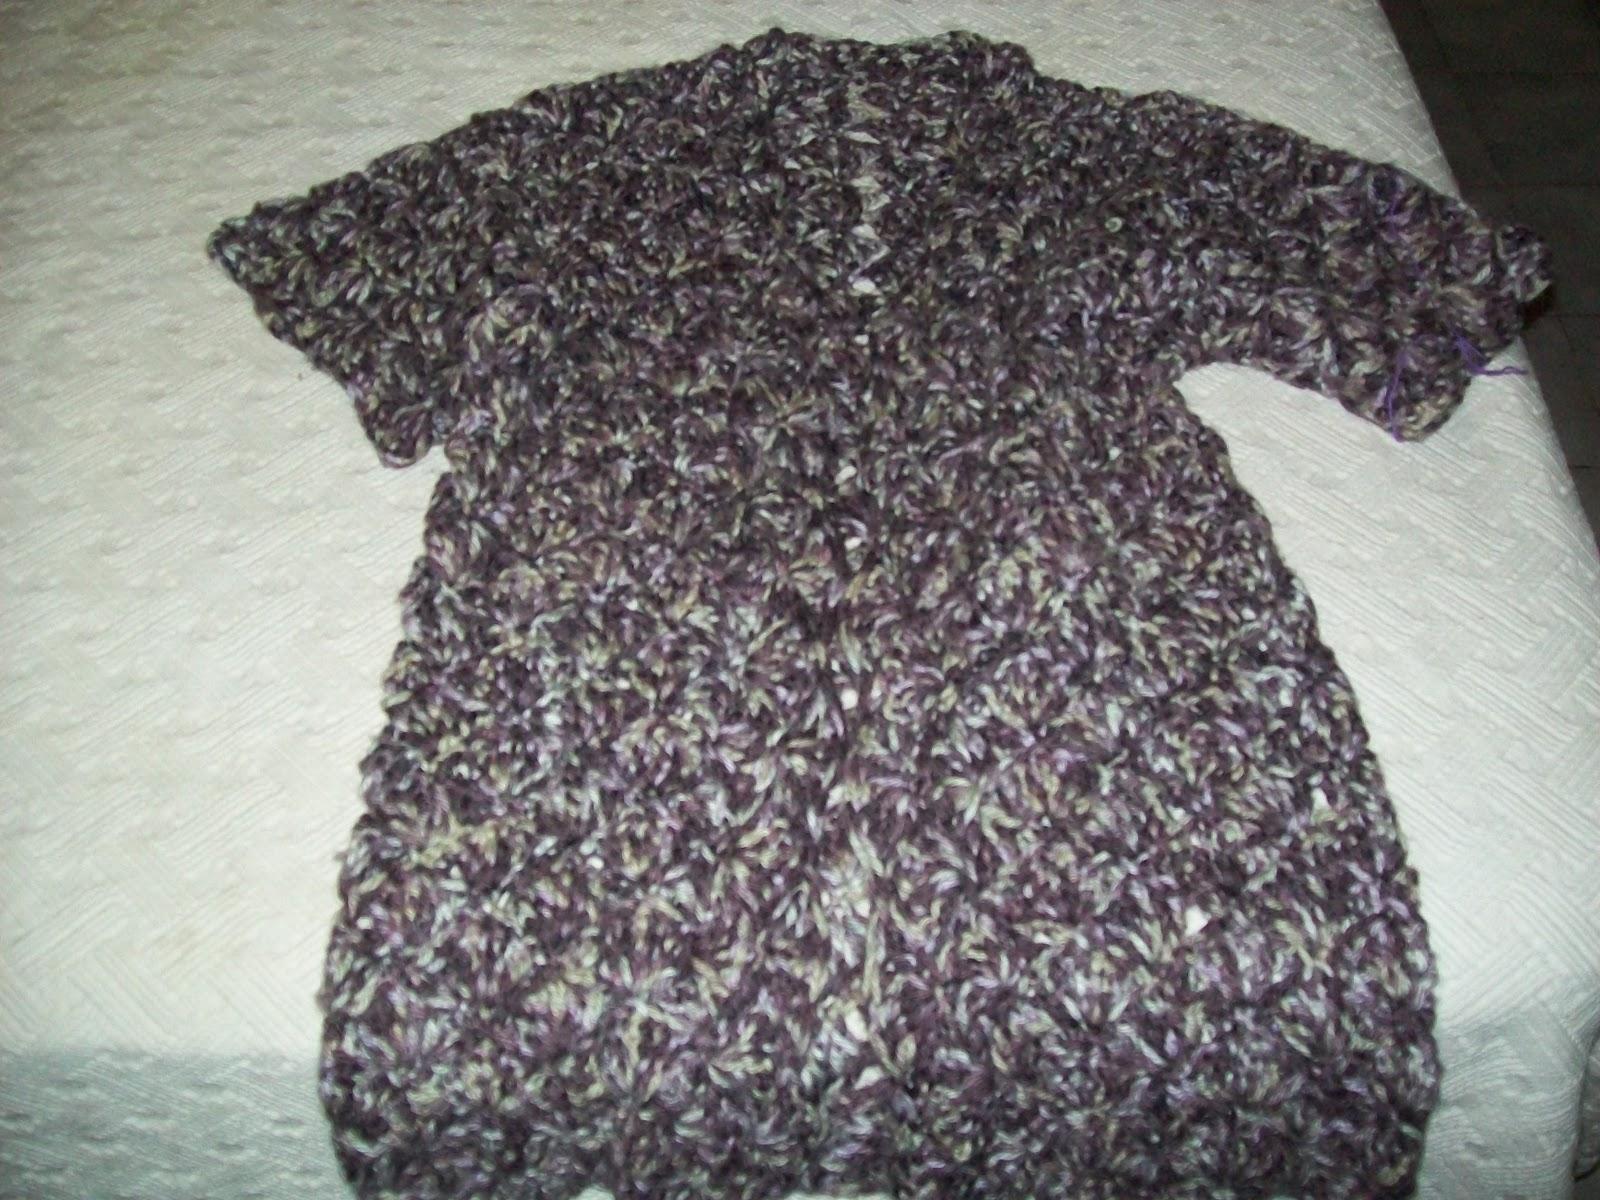 Saco Tejido Al Crochet Con Punto Fantas  A En Lana Matizada